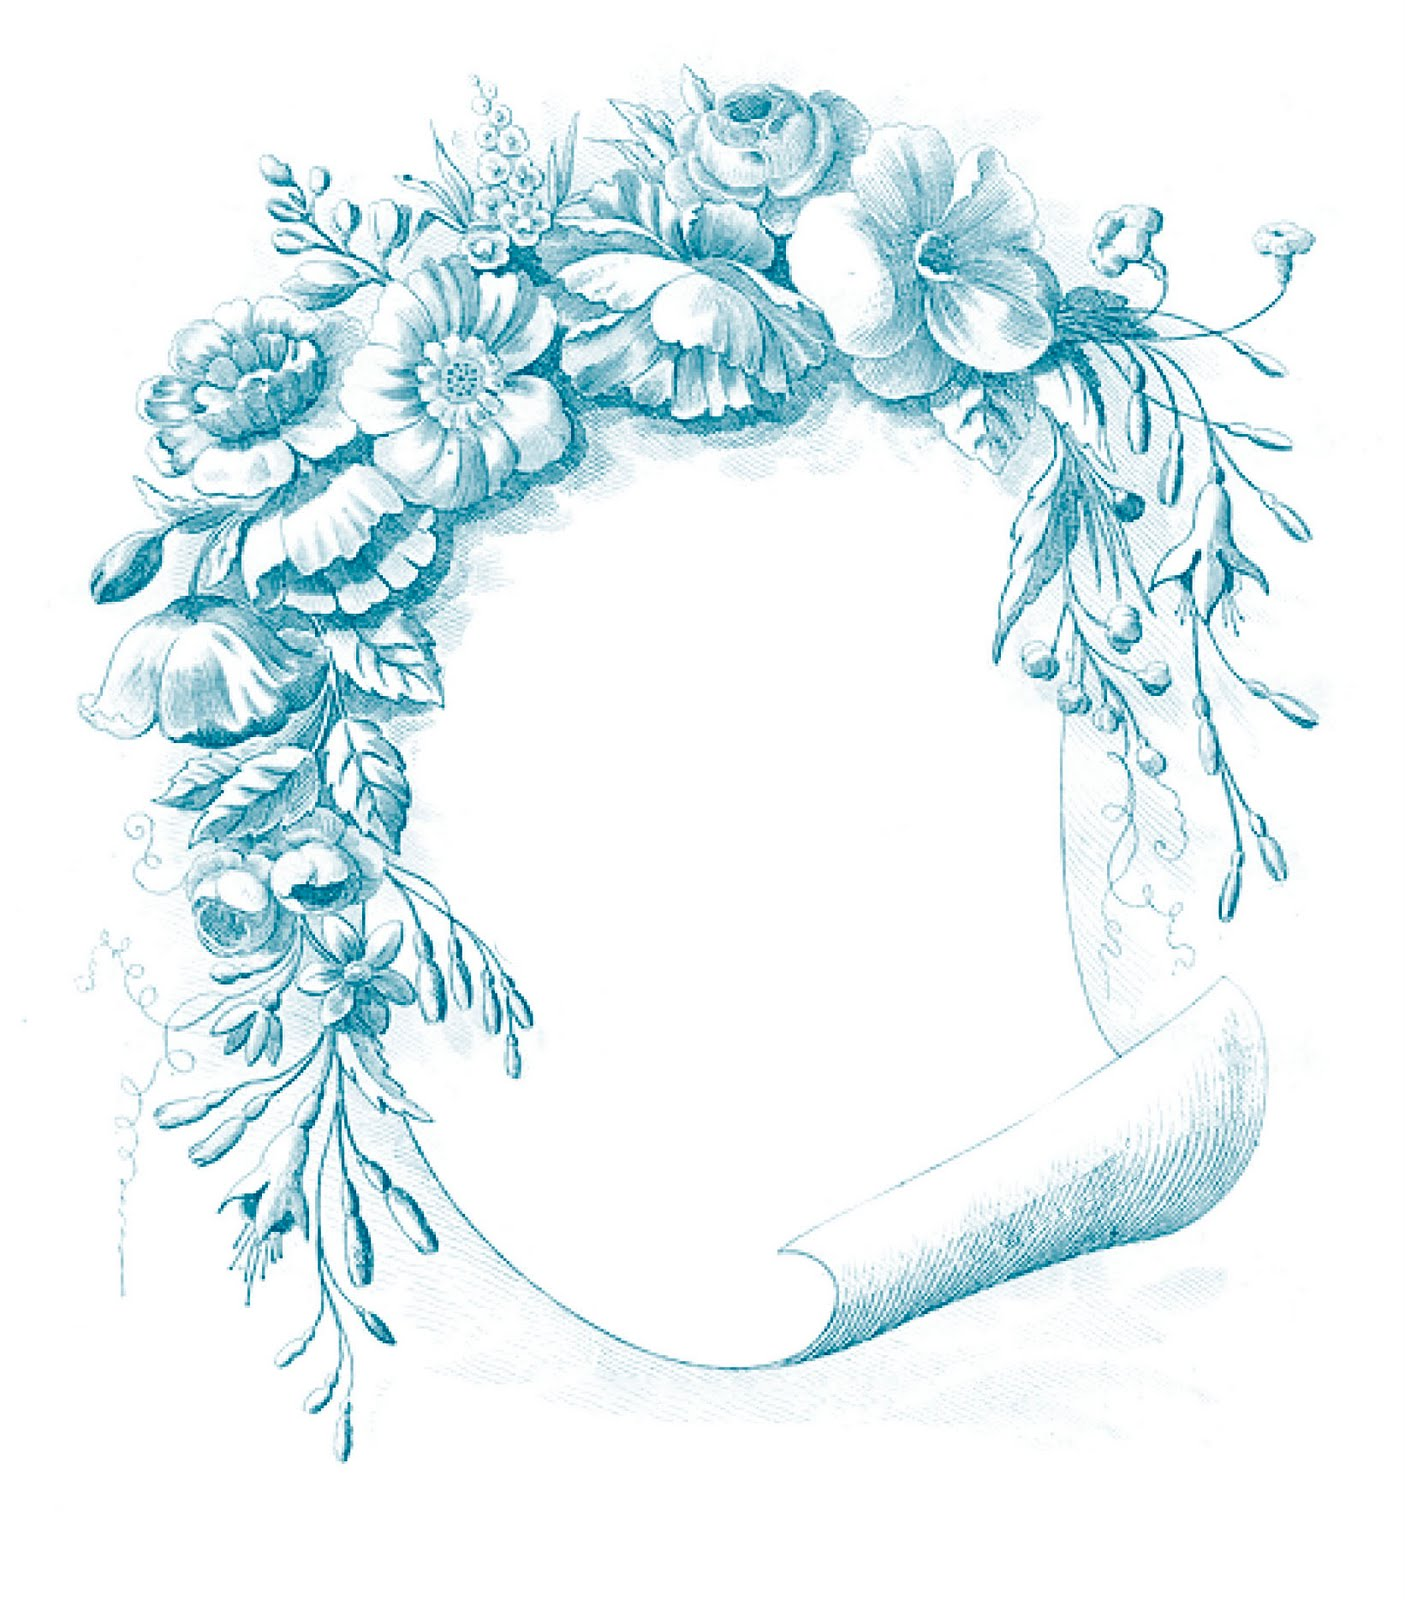 Blue vintage clipart clipart royalty free stock Vintage Clip Art - Gorgeous Floral Frame - The Graphics Fairy clipart royalty free stock